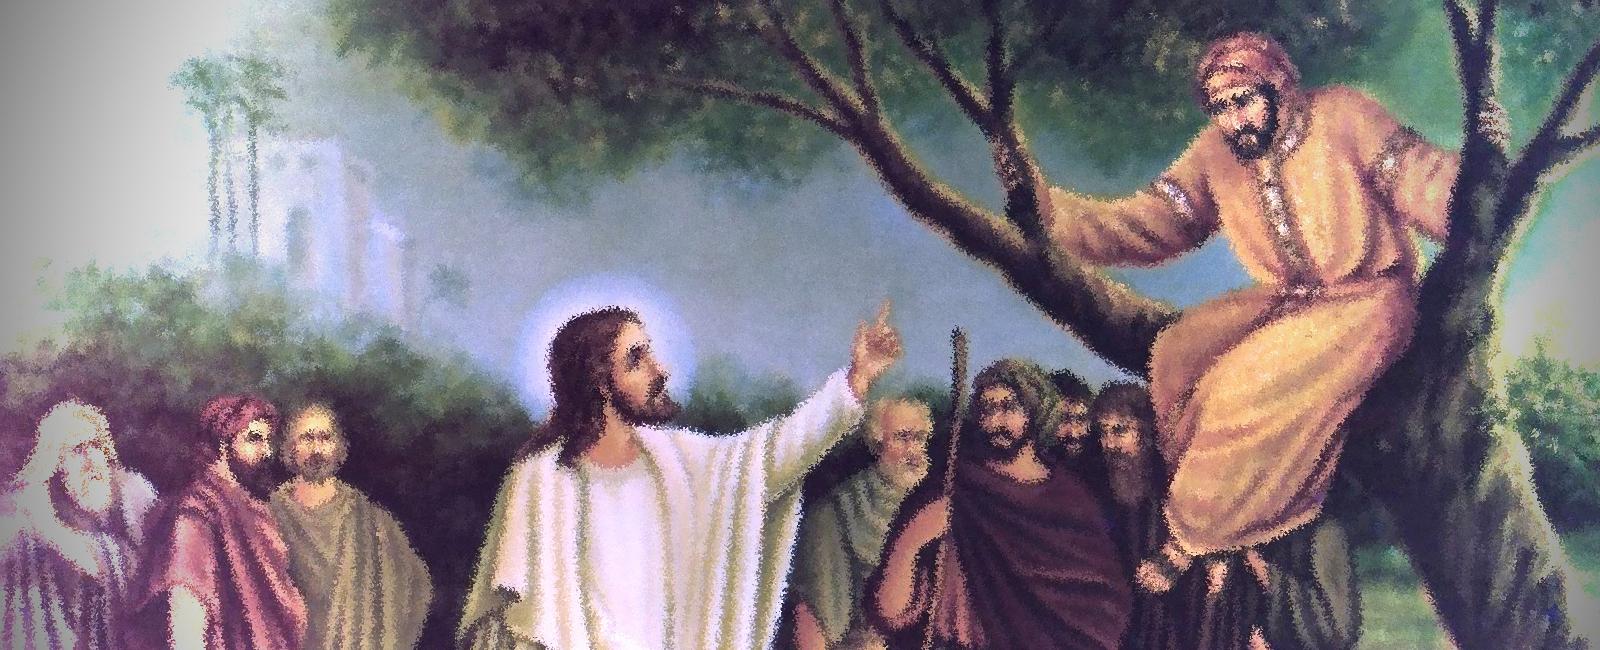 Parroquia El Altet - Evangelio Domingo 3 de Noviembre 2019